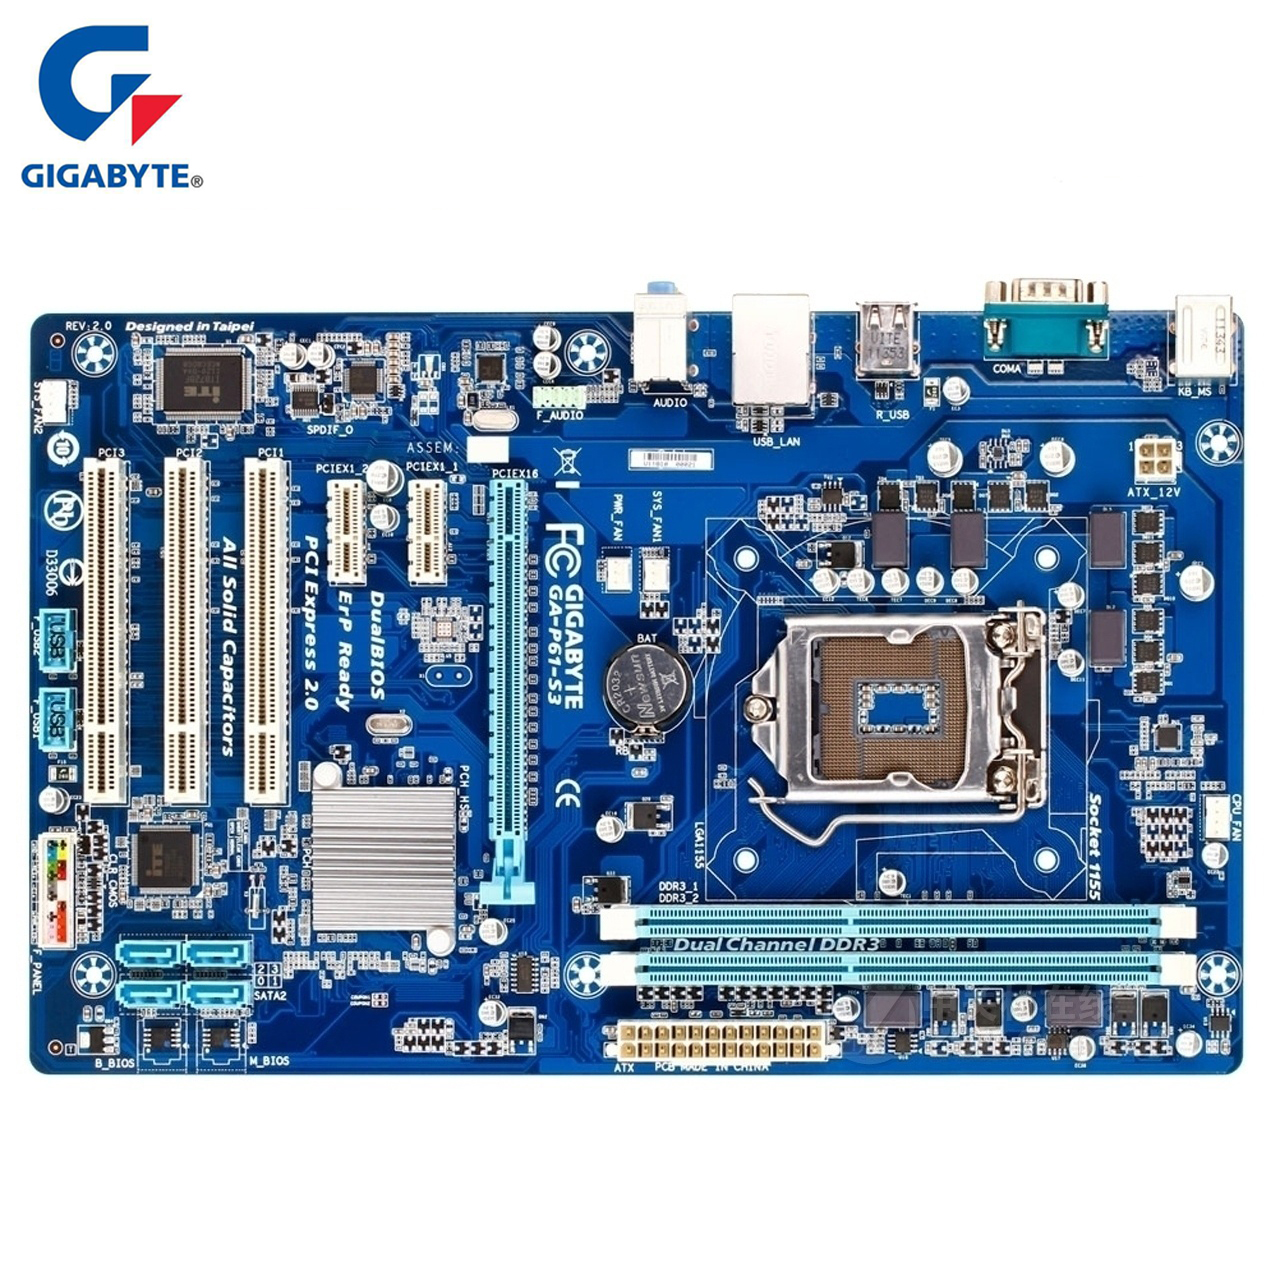 Gigabyte GA-P61-S3 Motherboard LGA1155 DDR3 USB2.0 16GB H61 P61 S3 Desktop Mainboard Systemboard SATA II PCI-E 3.0 Used asus p5g41t m lx3 plus motherboard lga 775 ddr3 8gb for intel g41 p5g41t m lx3 plus desktop mainboard systemboard sata ii used